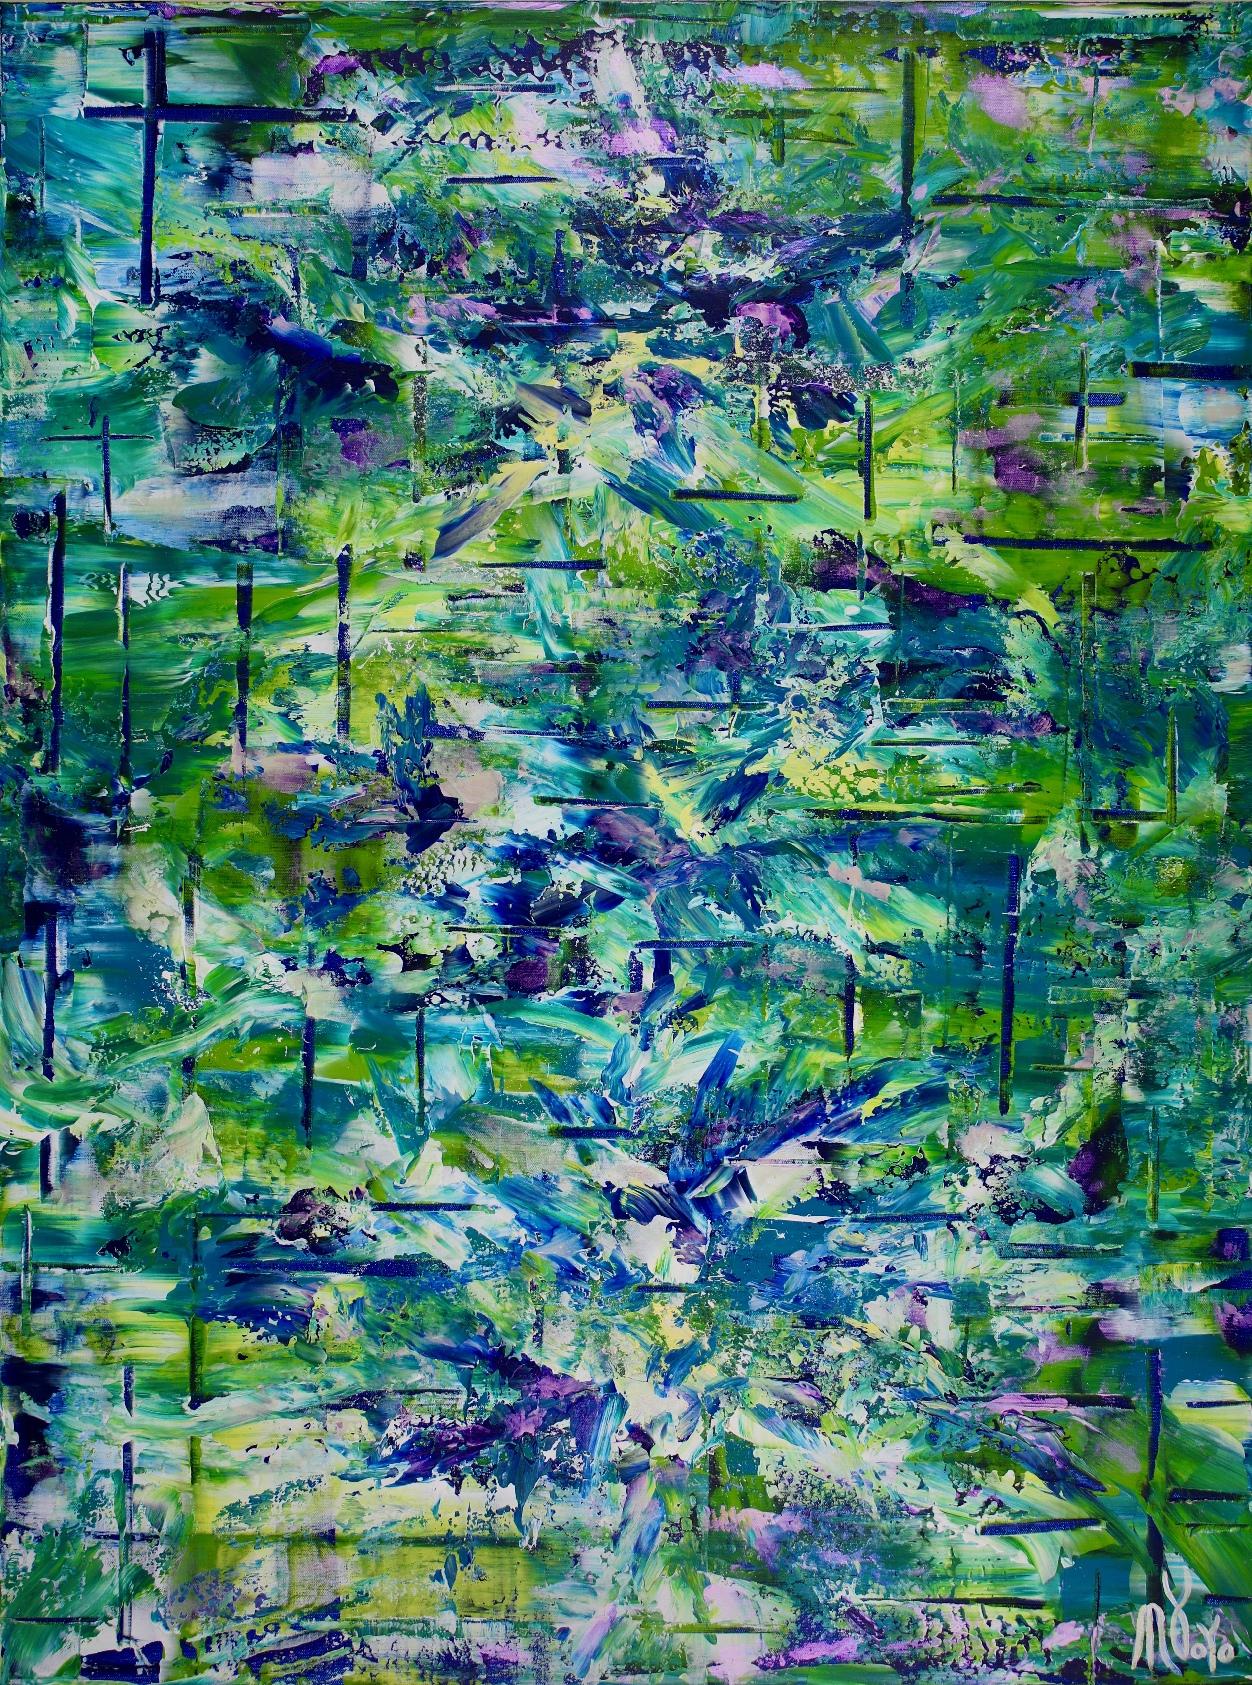 Terra Verde ( forest infinity) by Nestor Toro (2019) Abstract Acrylic painting by Nestor Toro